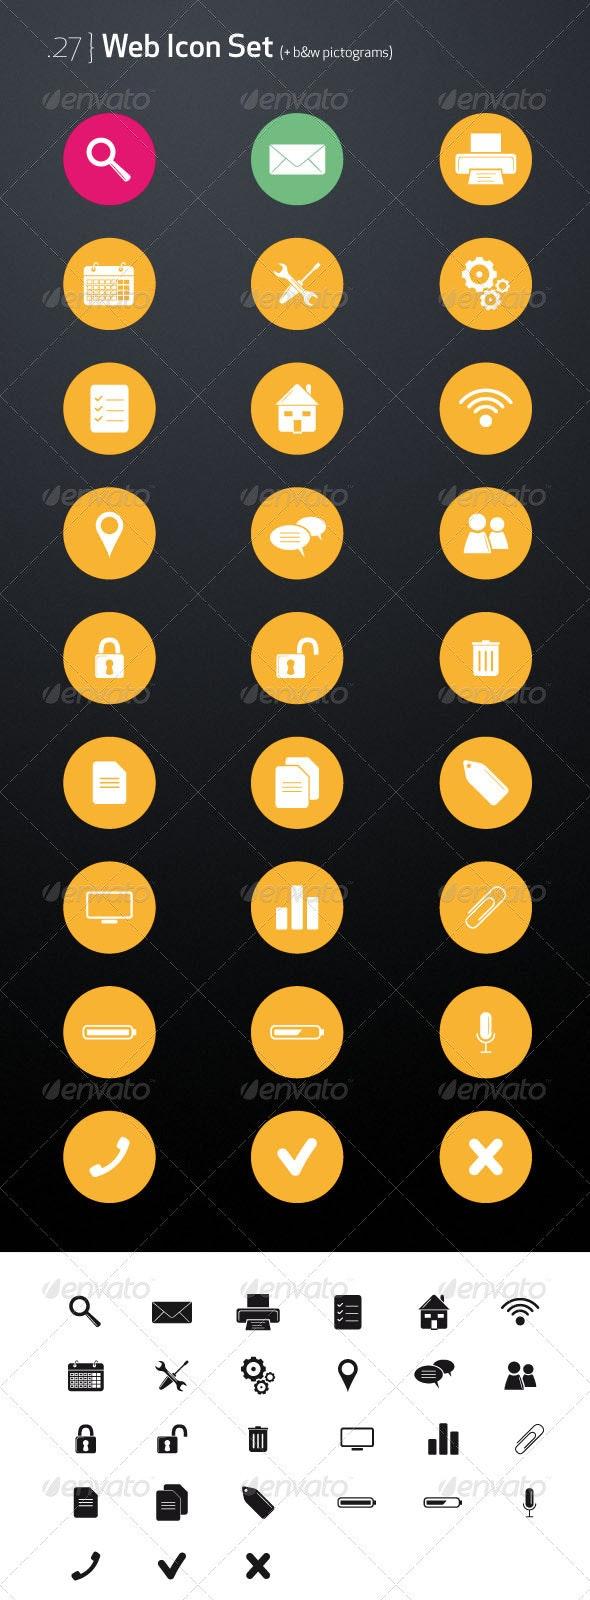 Web Icon Set & pictograms - Web Icons